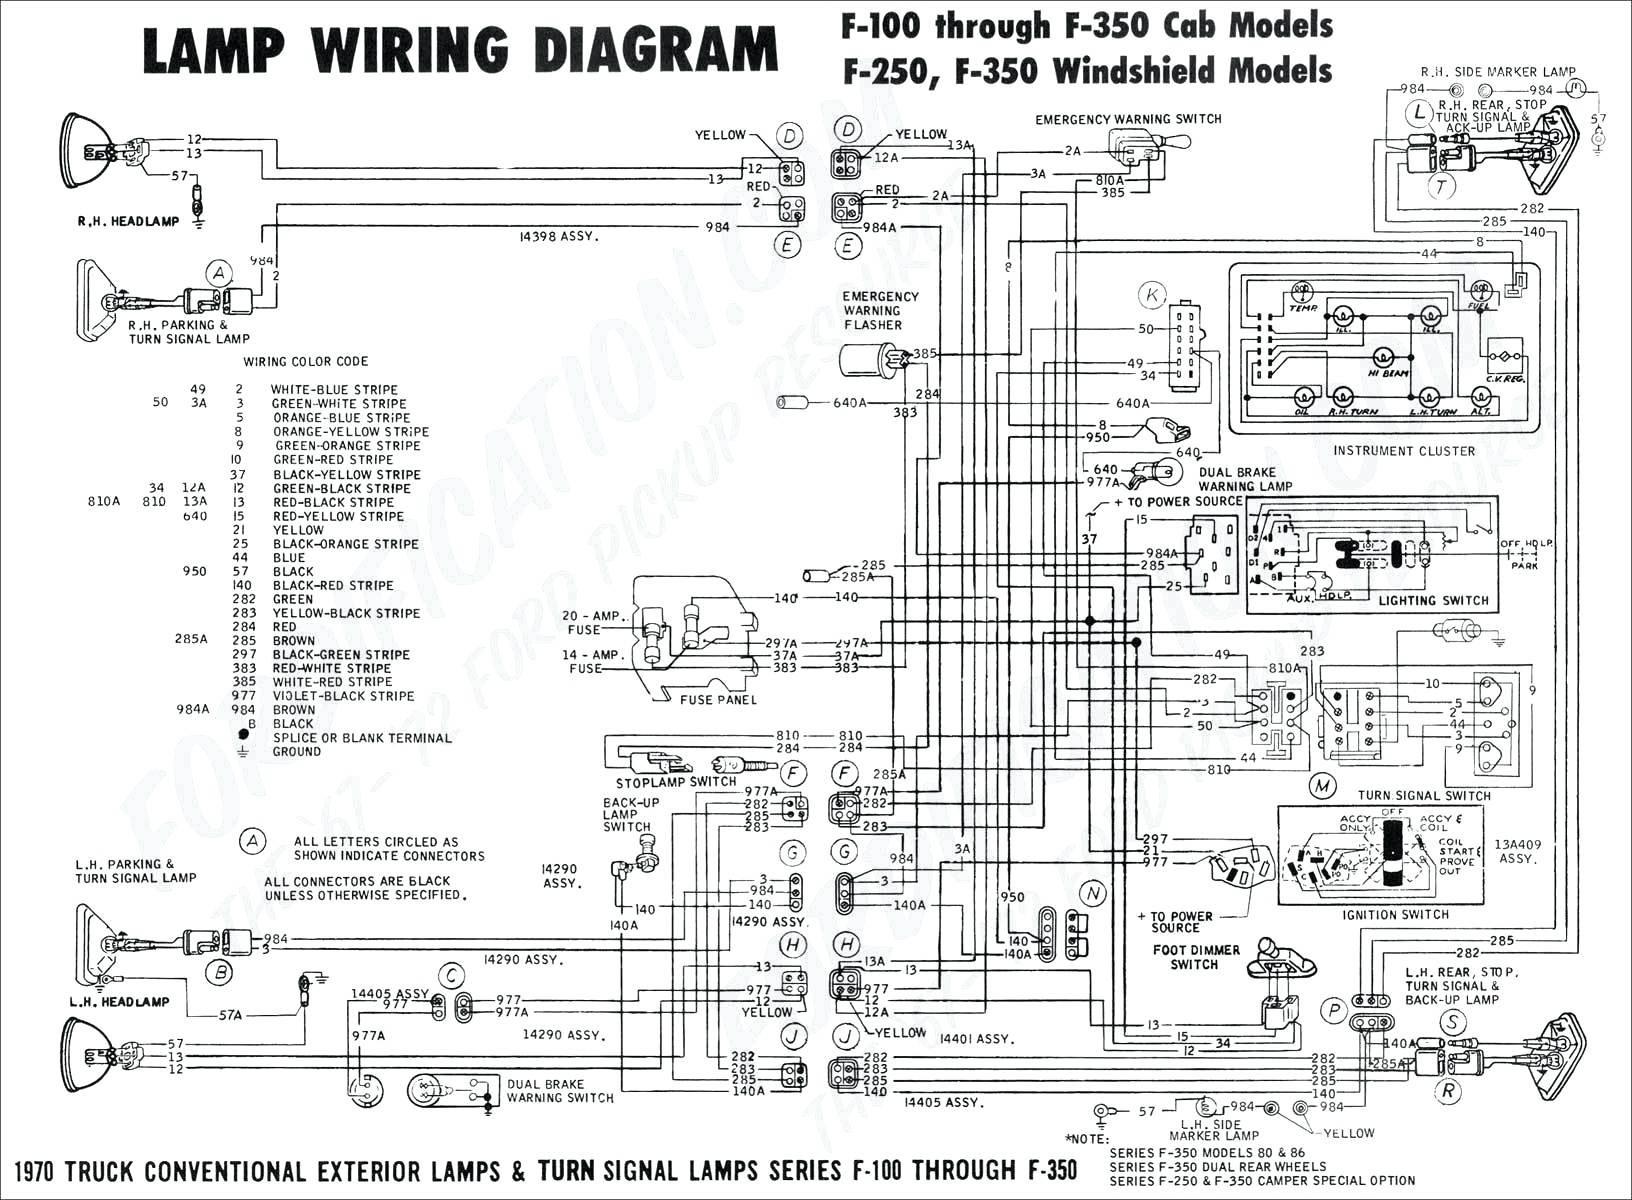 Ih 585 Wiring Diagram - Catalogue of Schemas International A C Wiring Diagram on